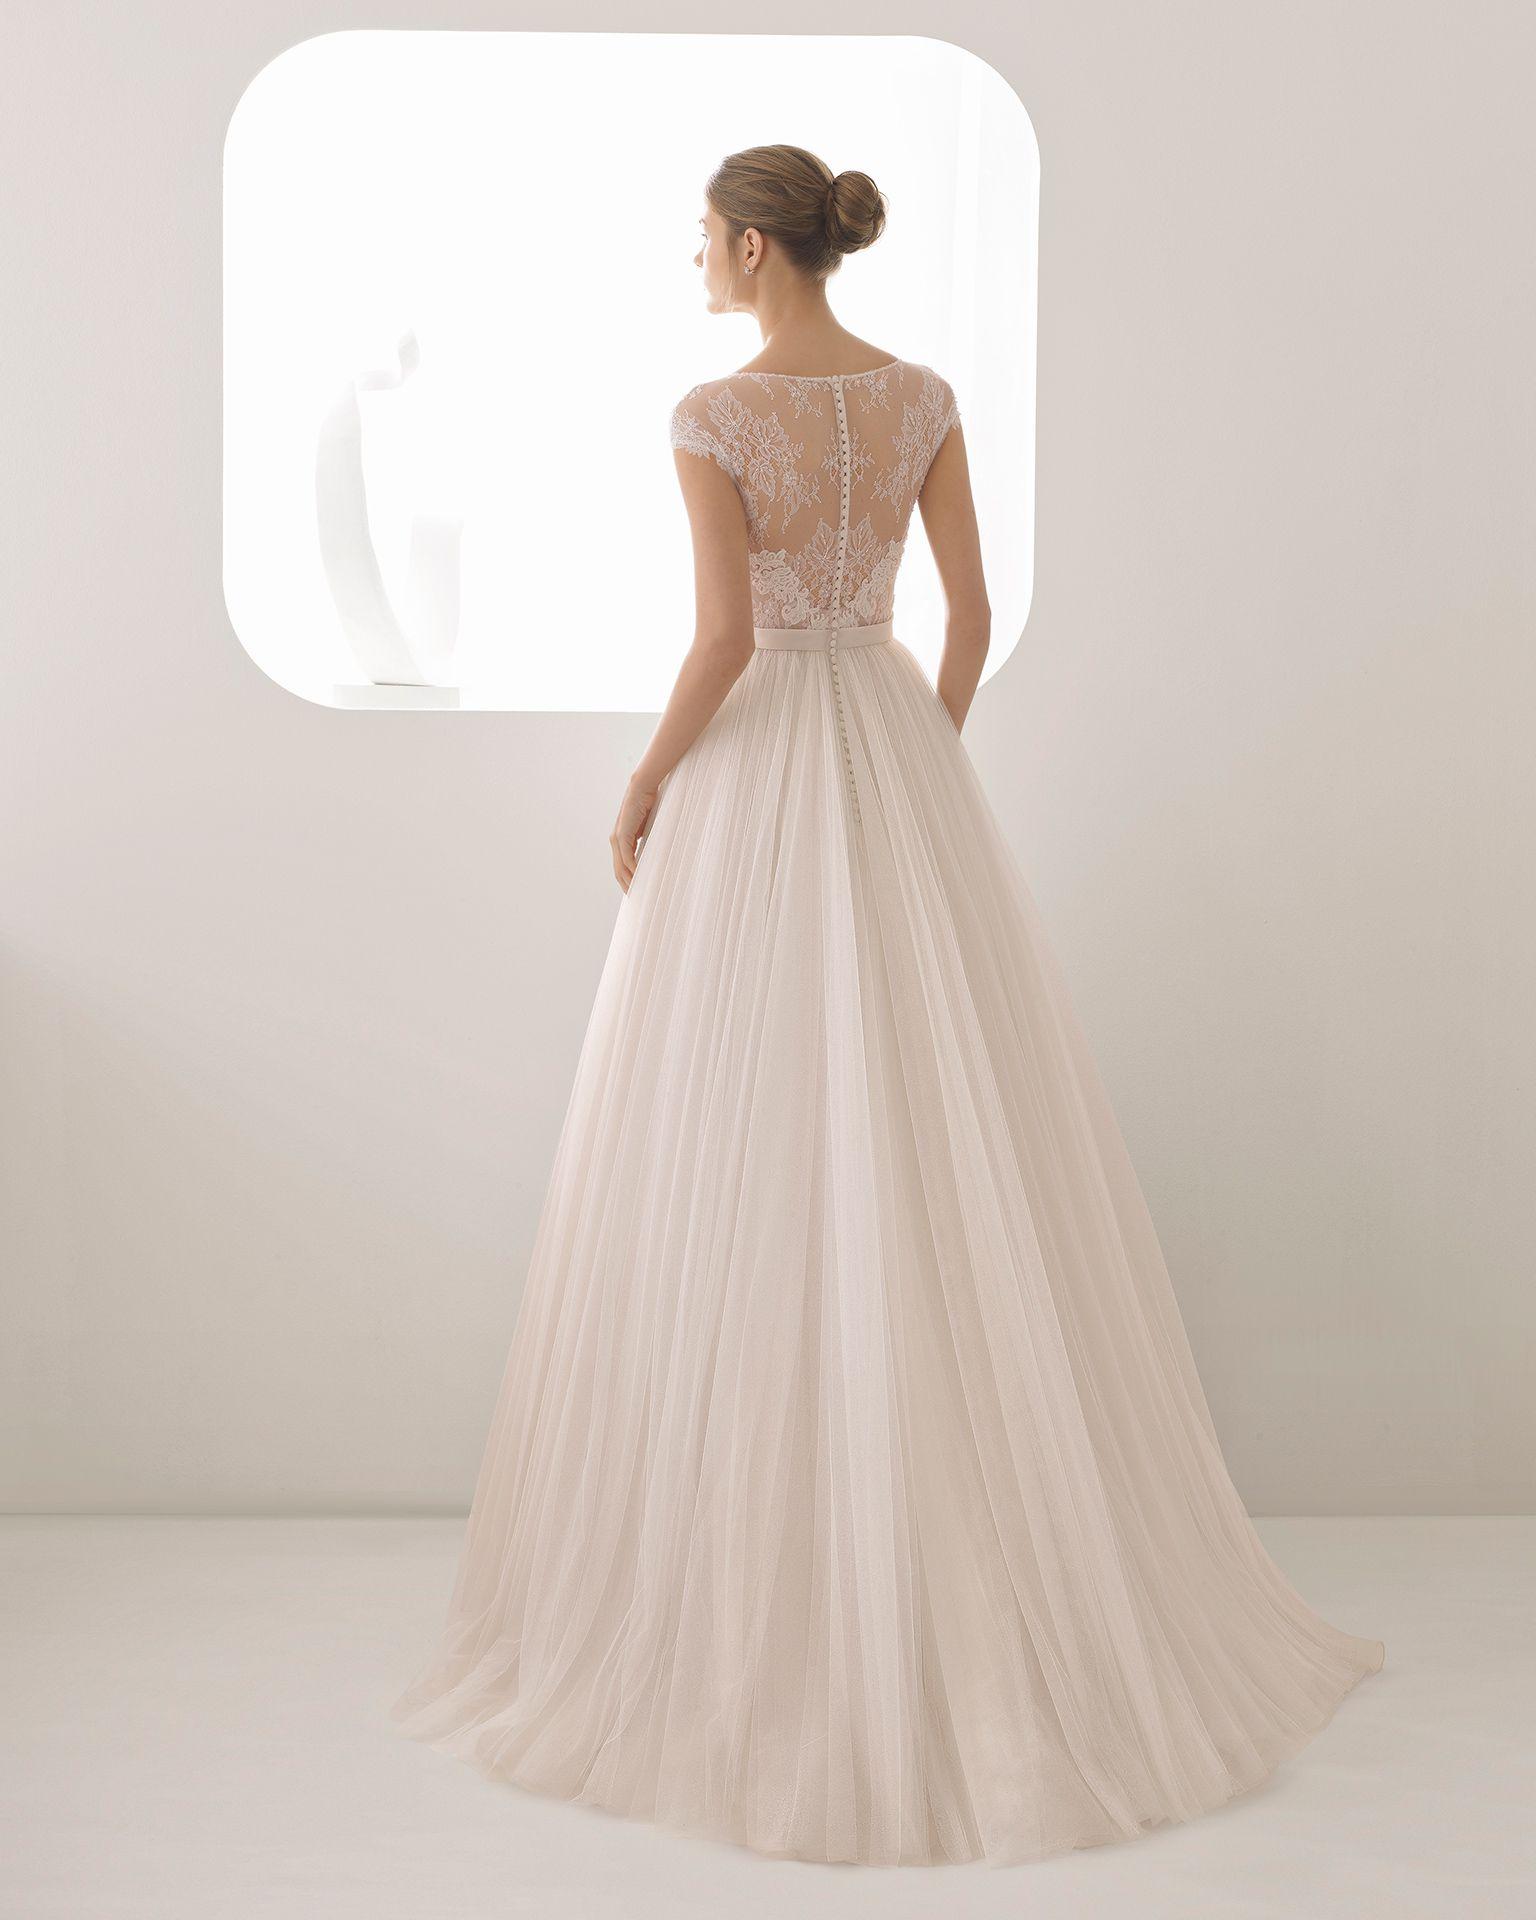 ALICIA - Hochzeit 2018. Rosa Clará Kollektion | Rosa clará, Tüll und ...